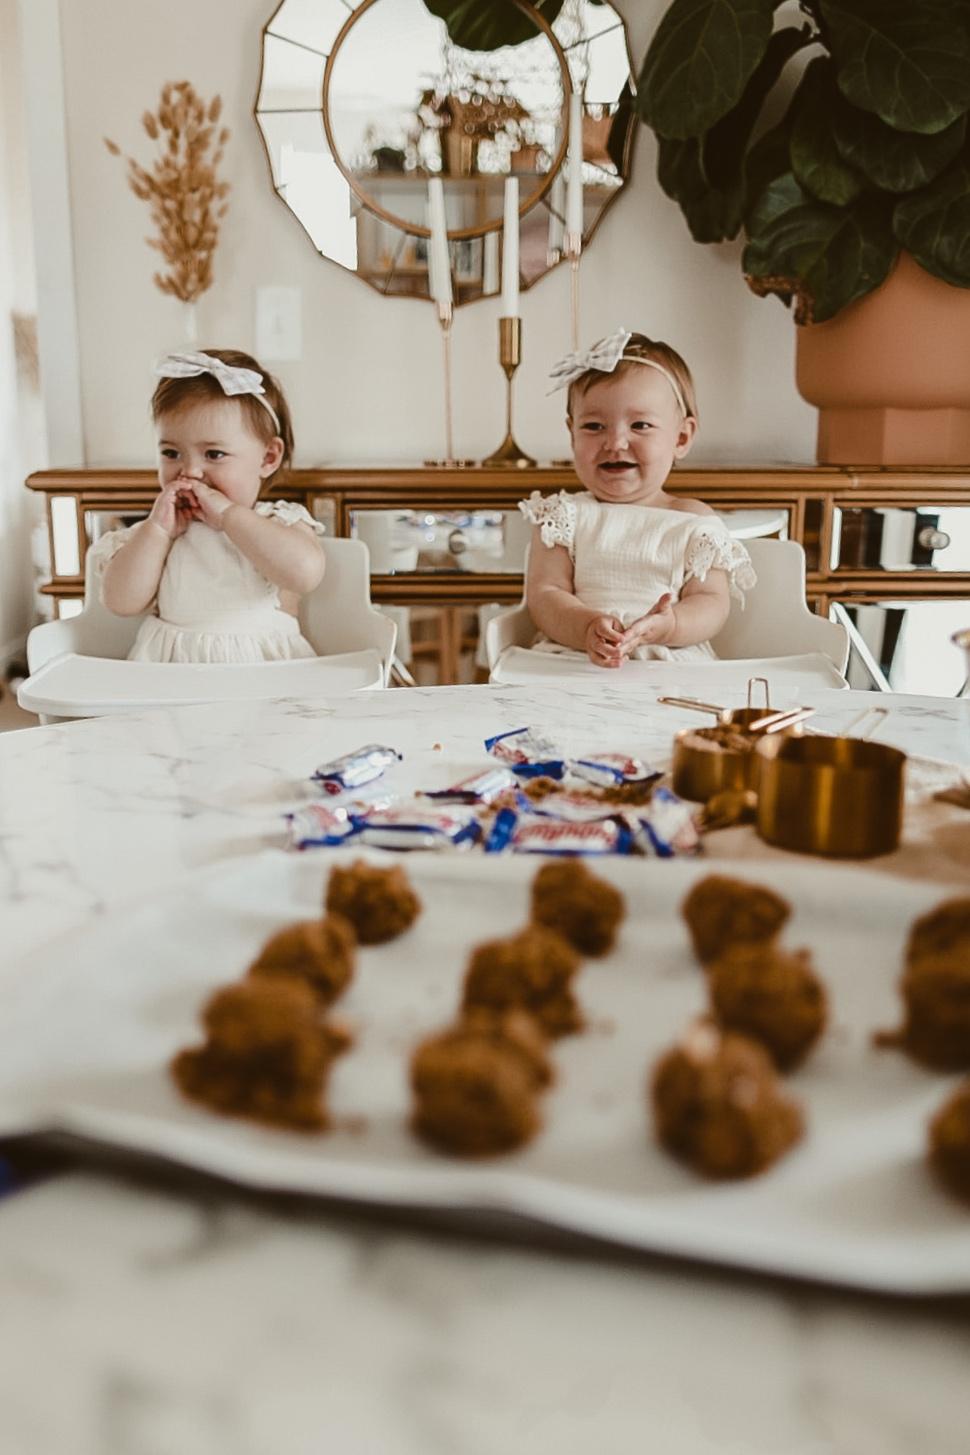 Baby Ruth®️ Cookies - MODAPRINTS